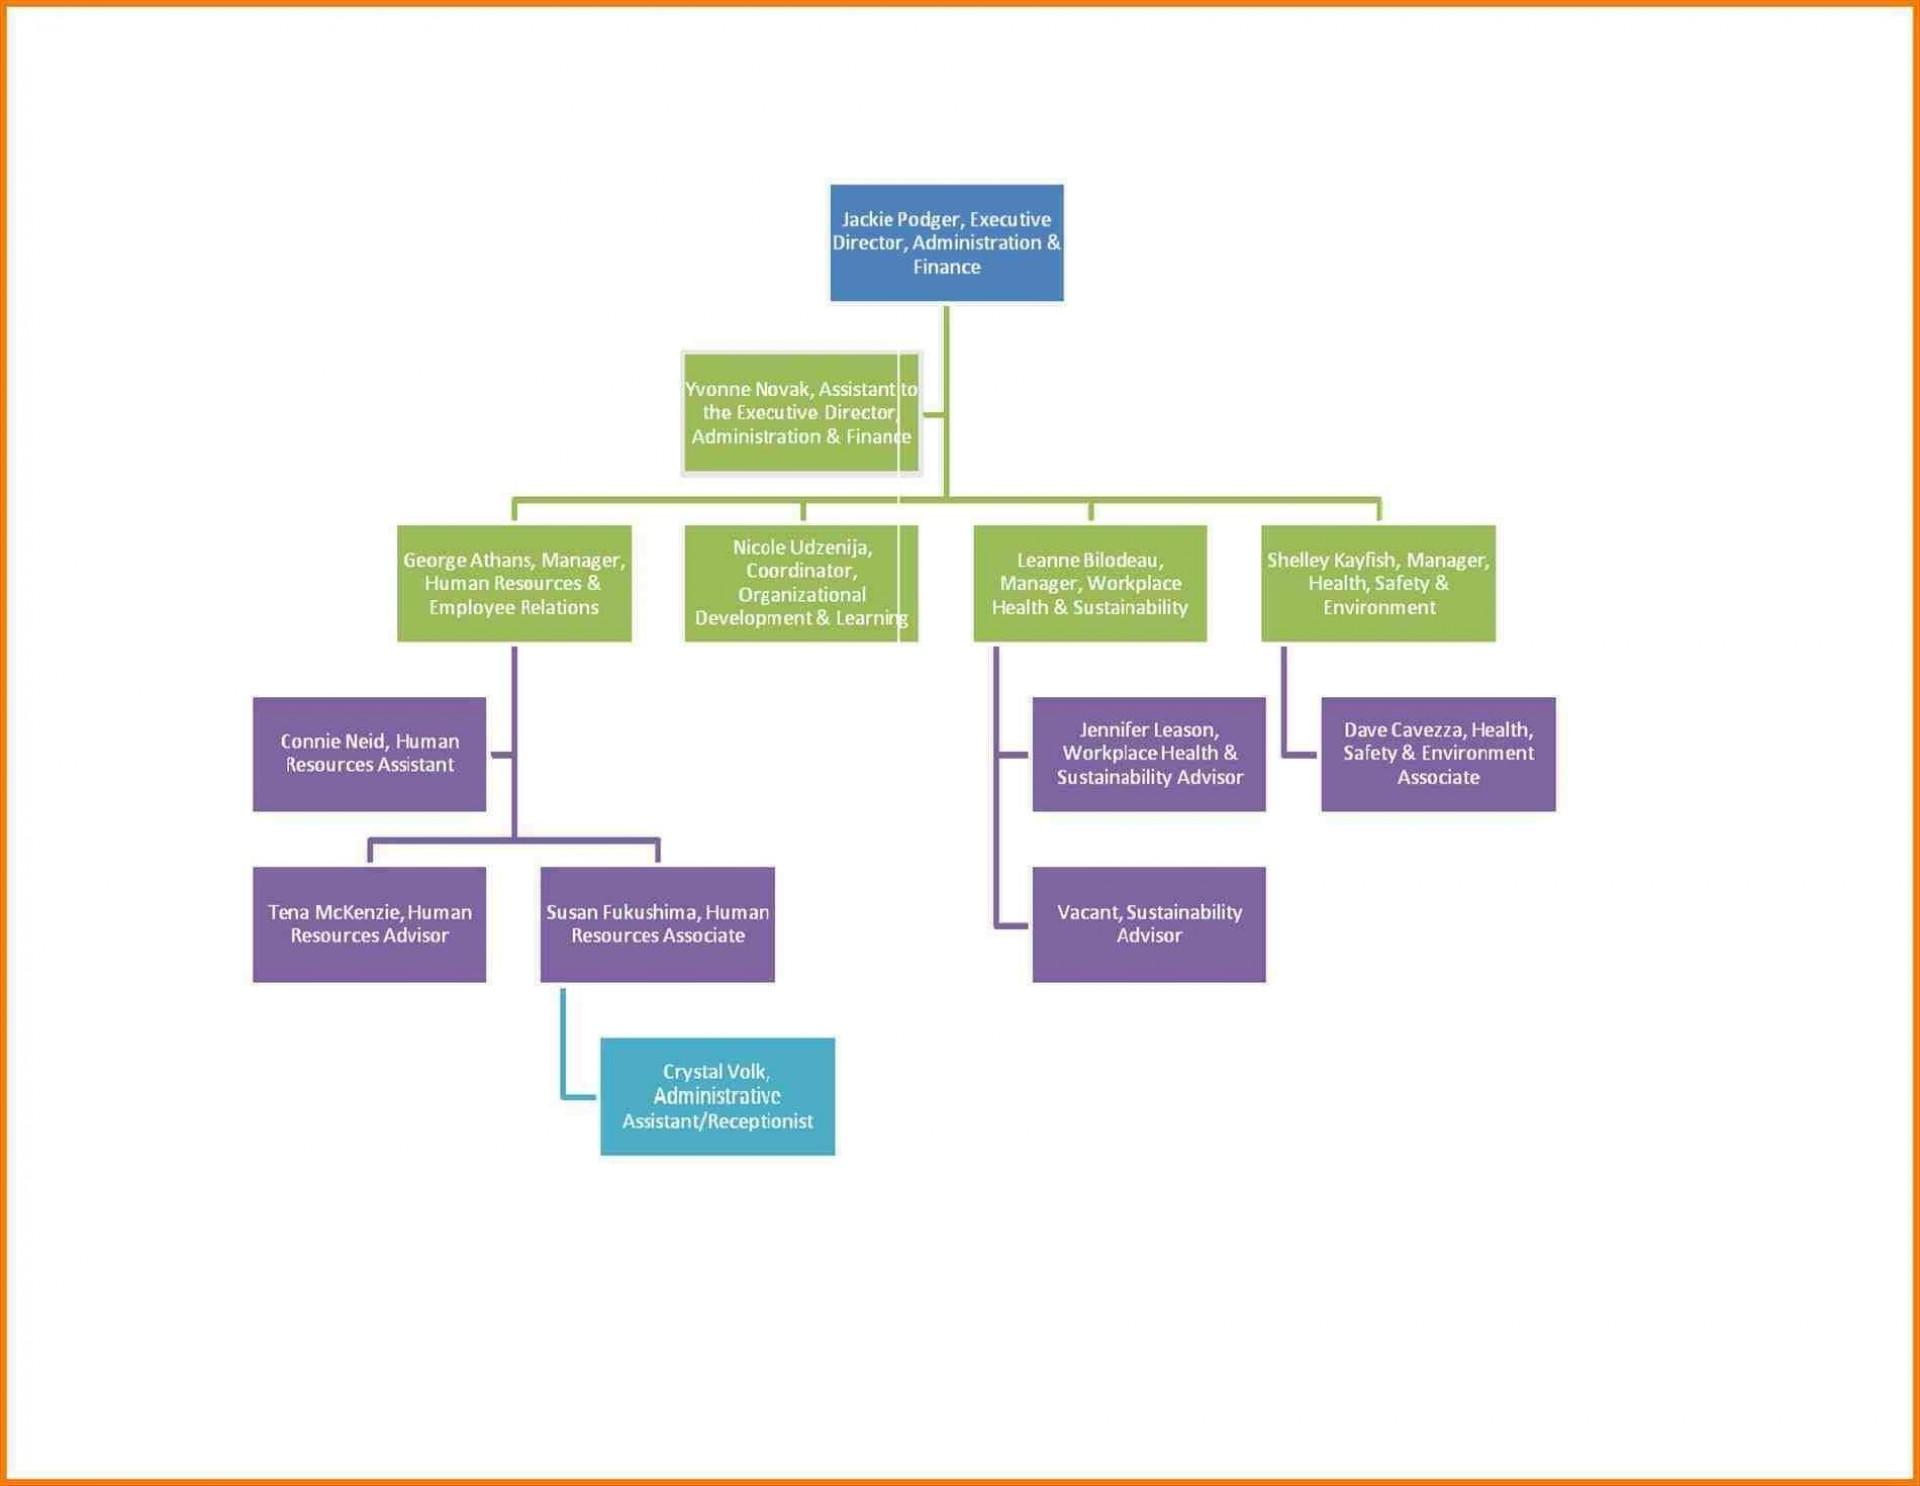 001 Astounding Microsoft Word Organization Chart Template High Definition  Organizational Download 20071920